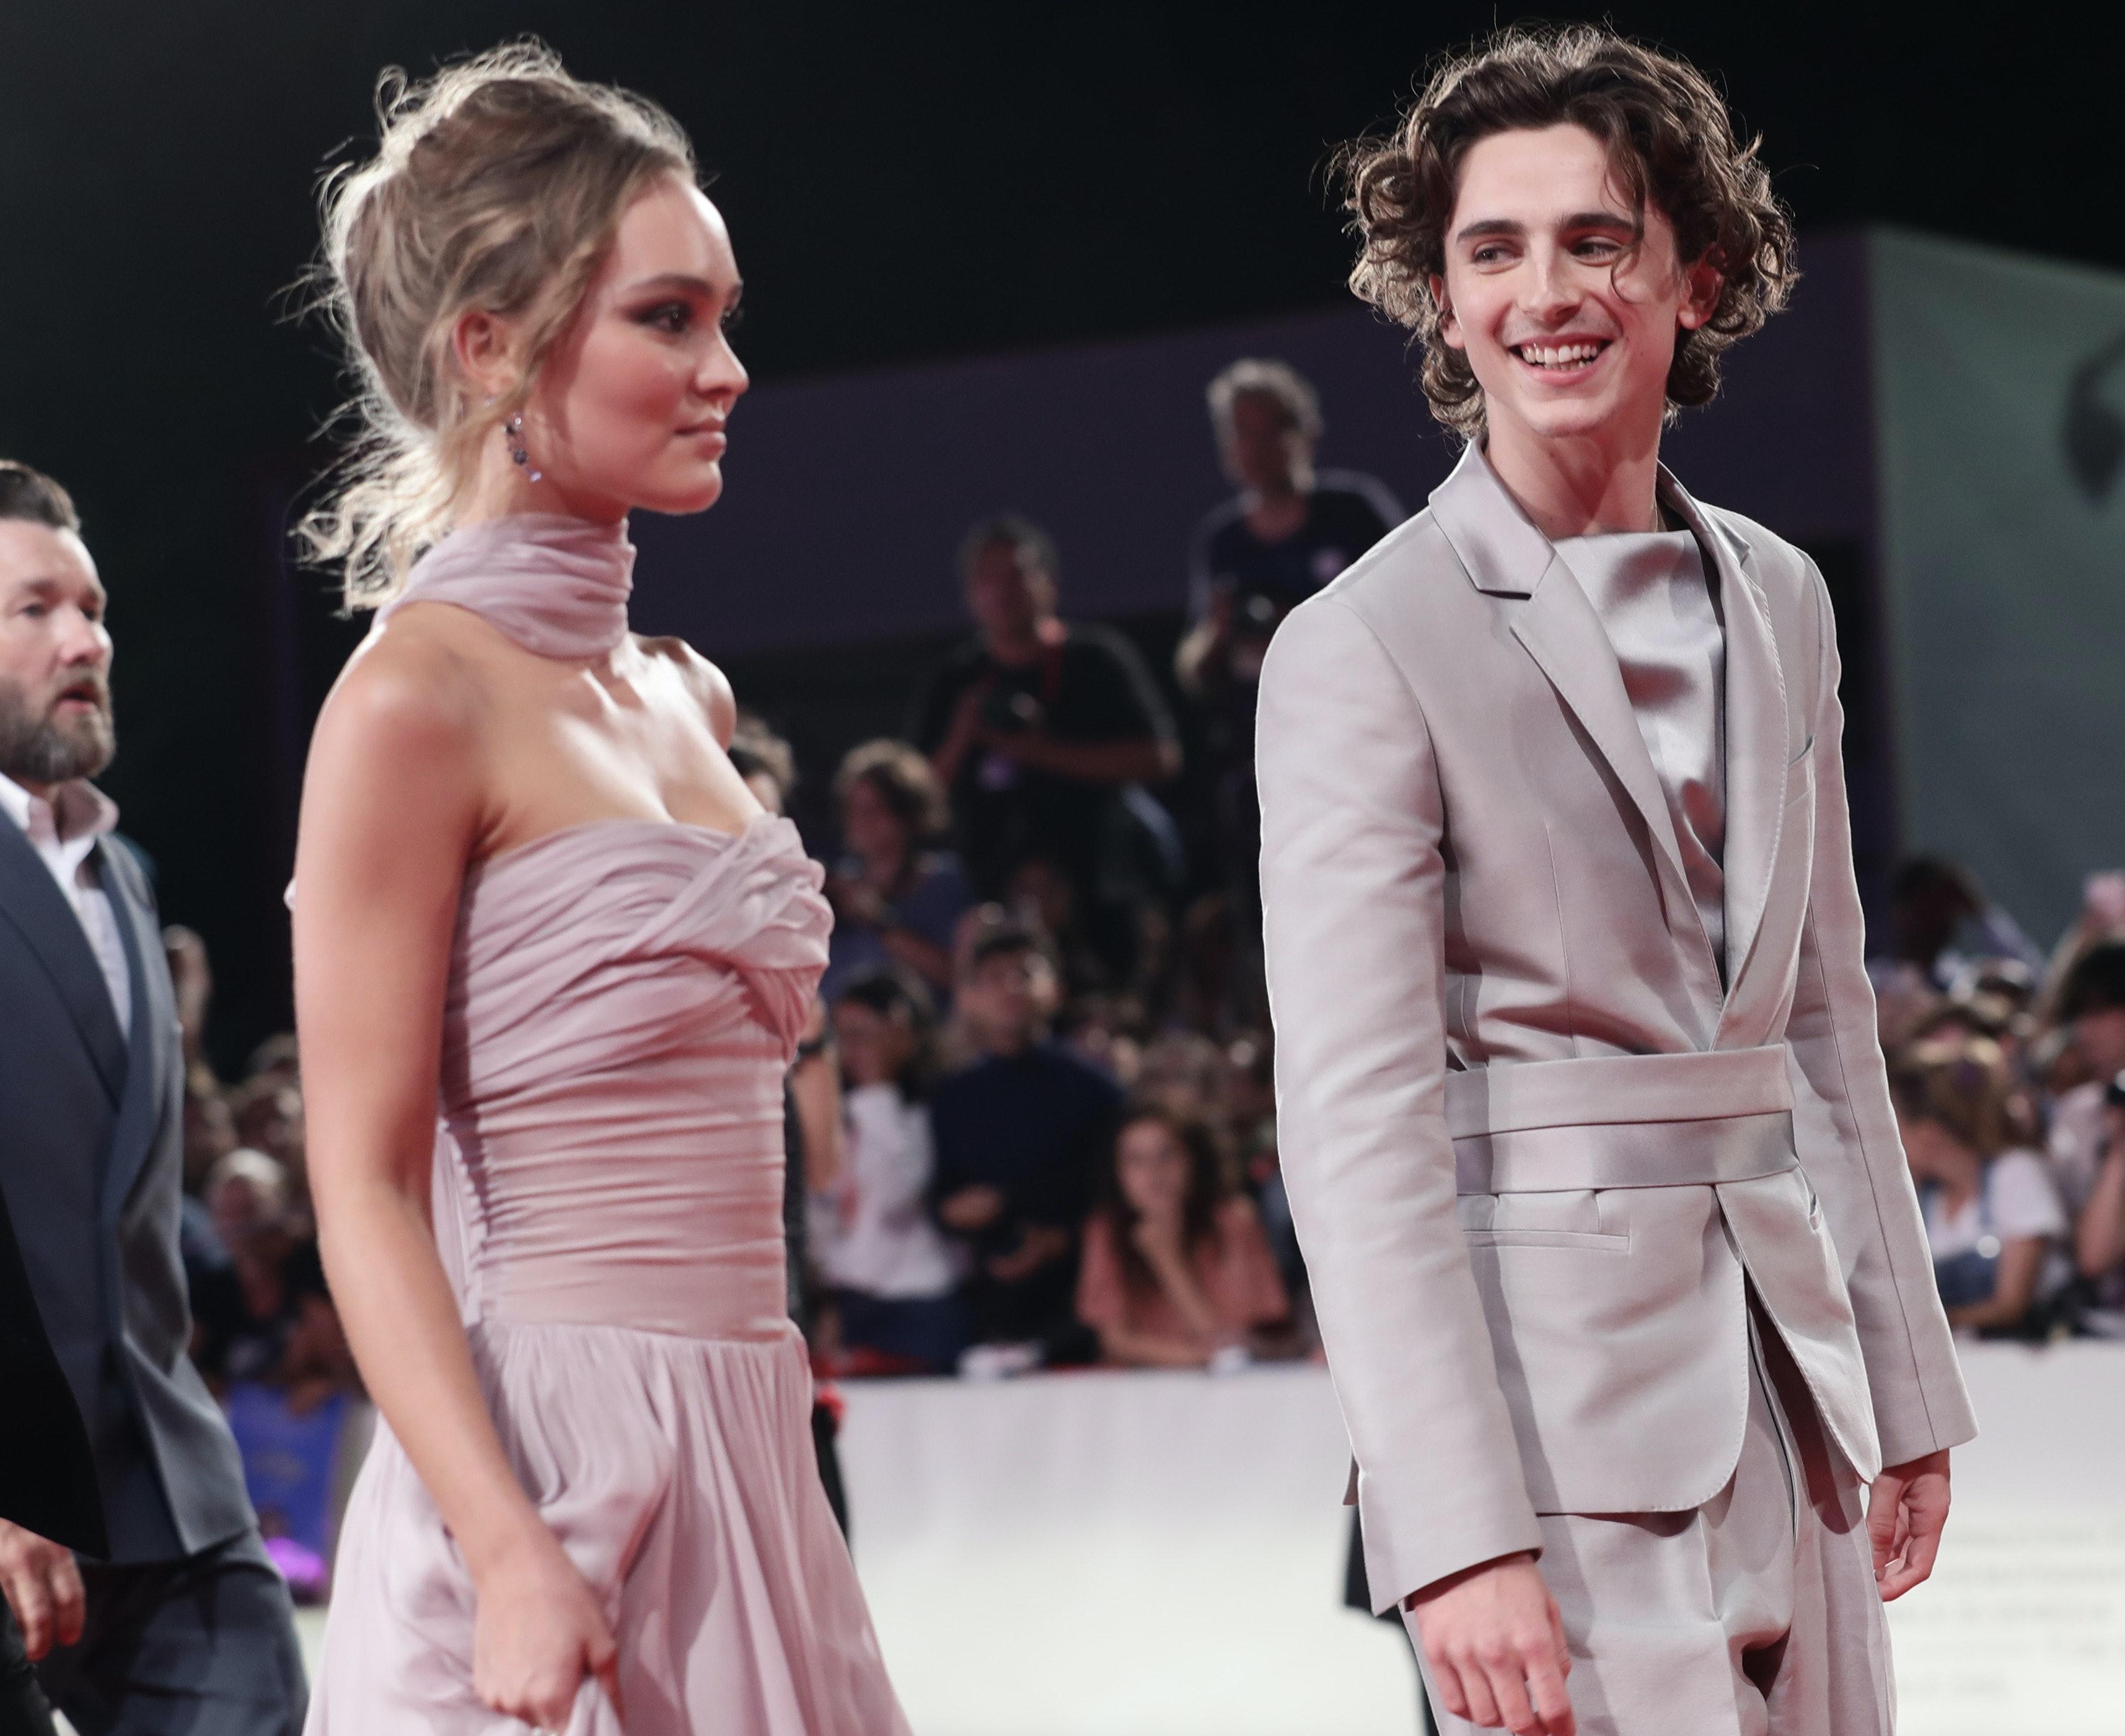 Timothee Chalamet Lily Rose Depp S Relationship Timeline Revolves Around The King